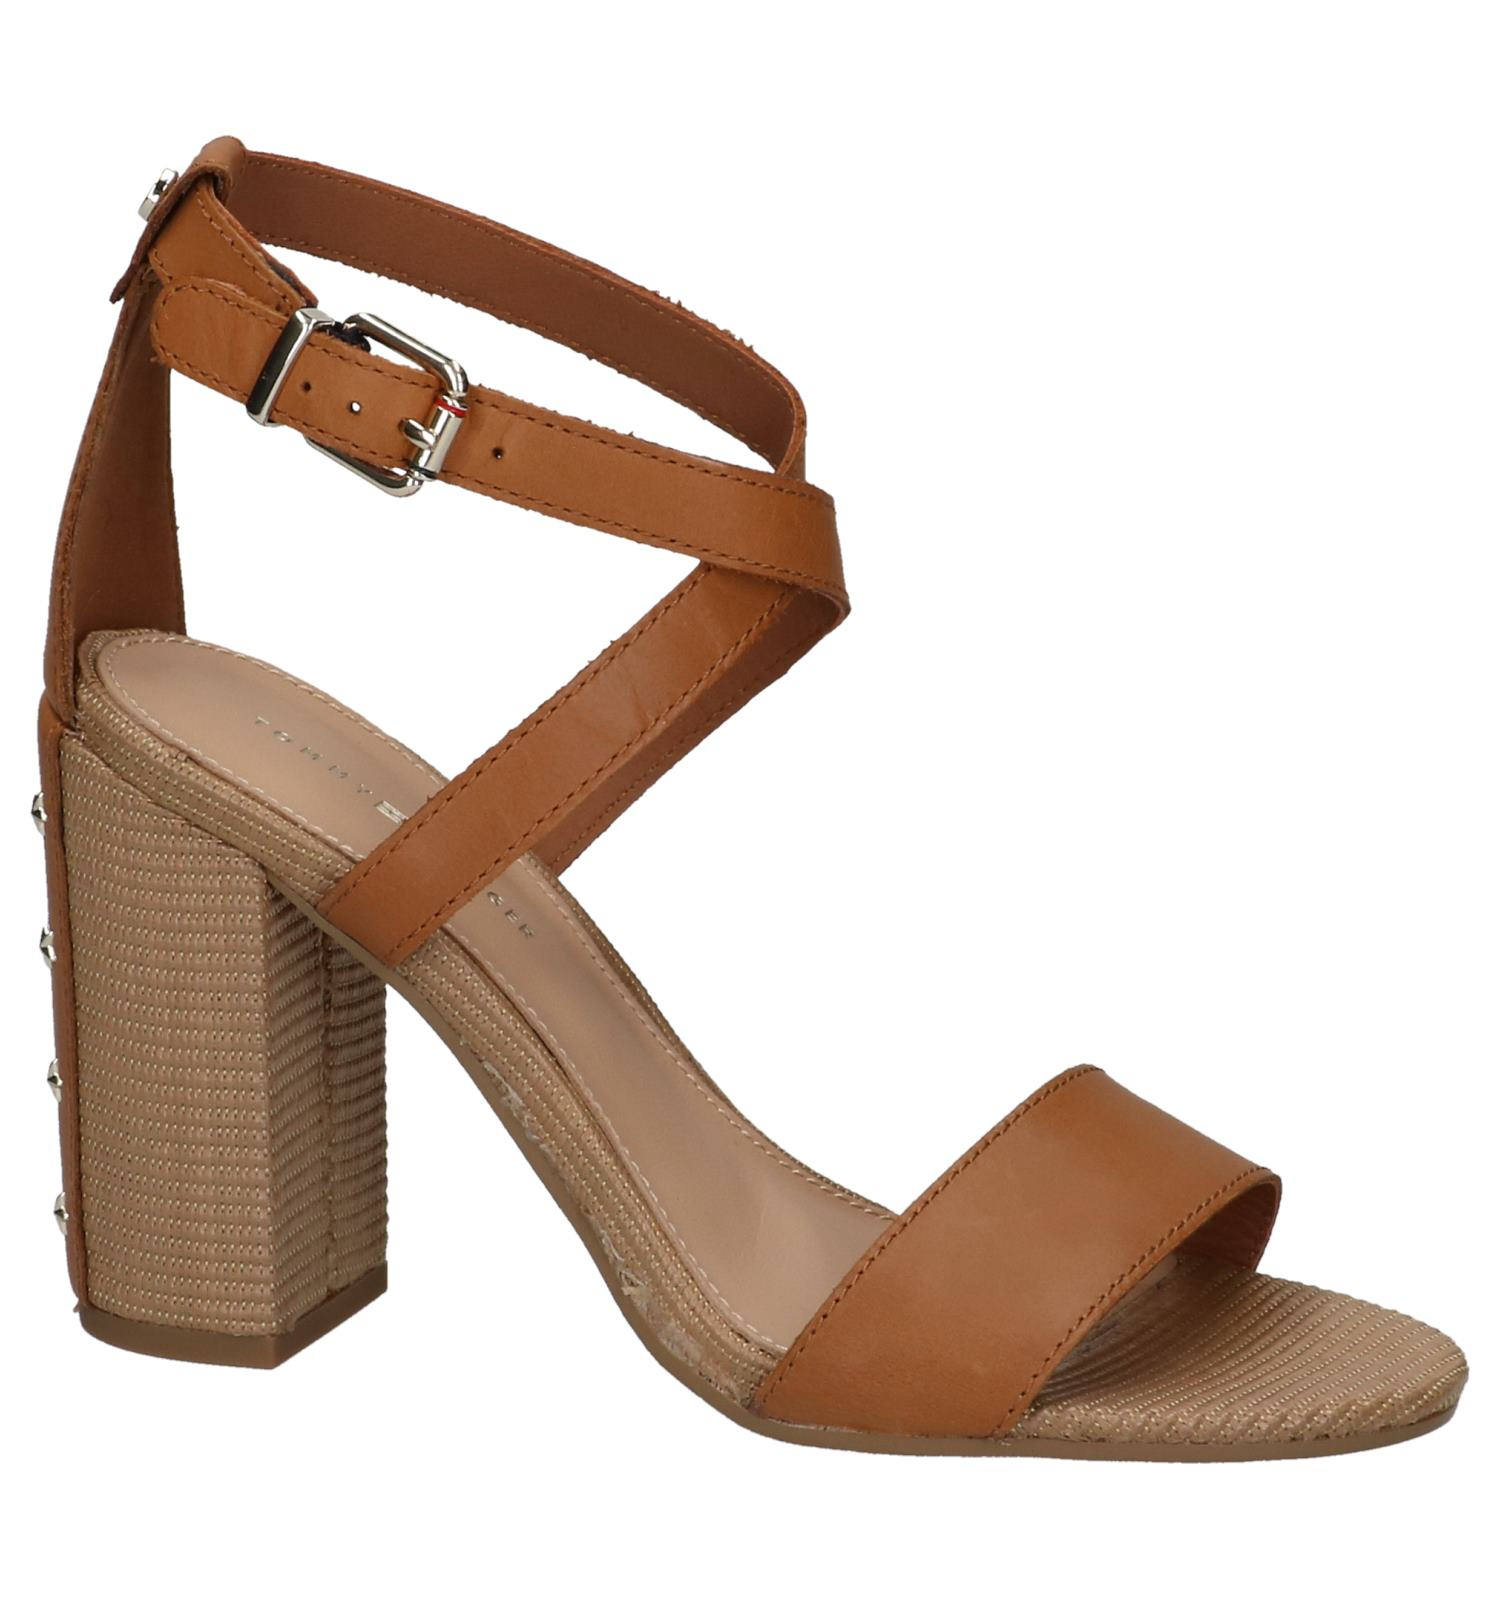 new style 422c9 d50d1 Cognac Tommy Hilfiger Feminine Heel Sandalen   TORFS.BE   Gratis verzend en  retour